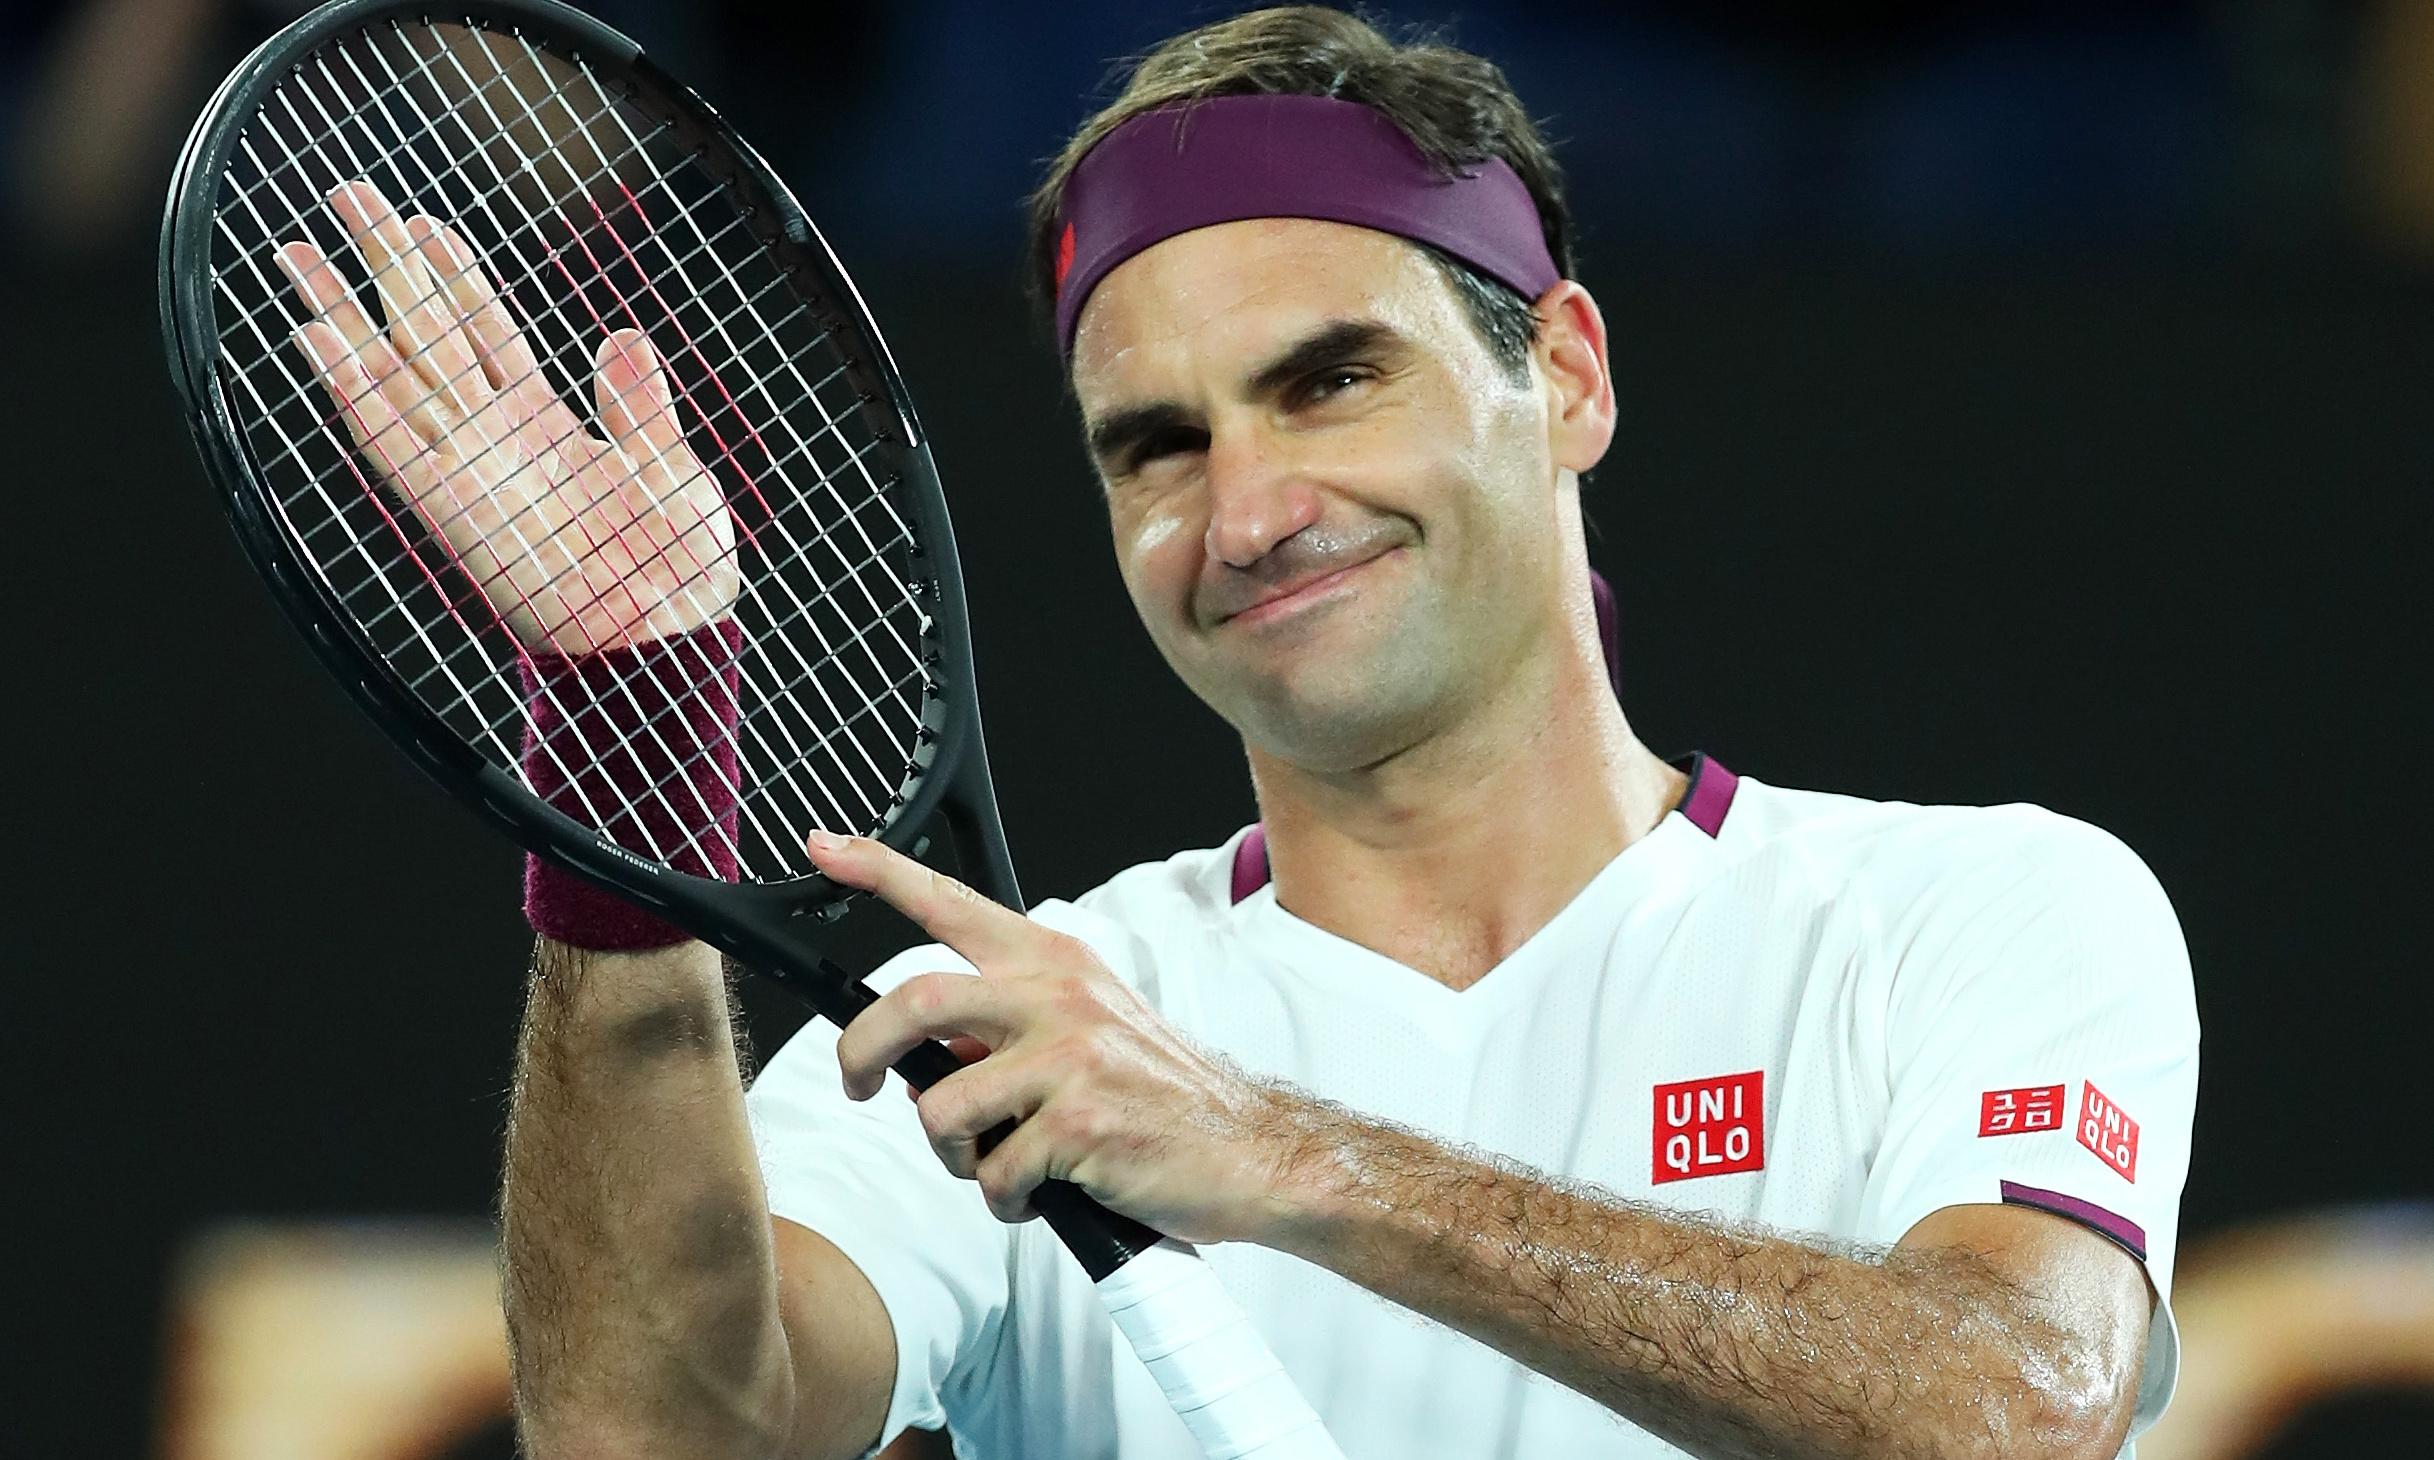 Roger Federer survives scare to set up Australian Open meeting with Sandgren